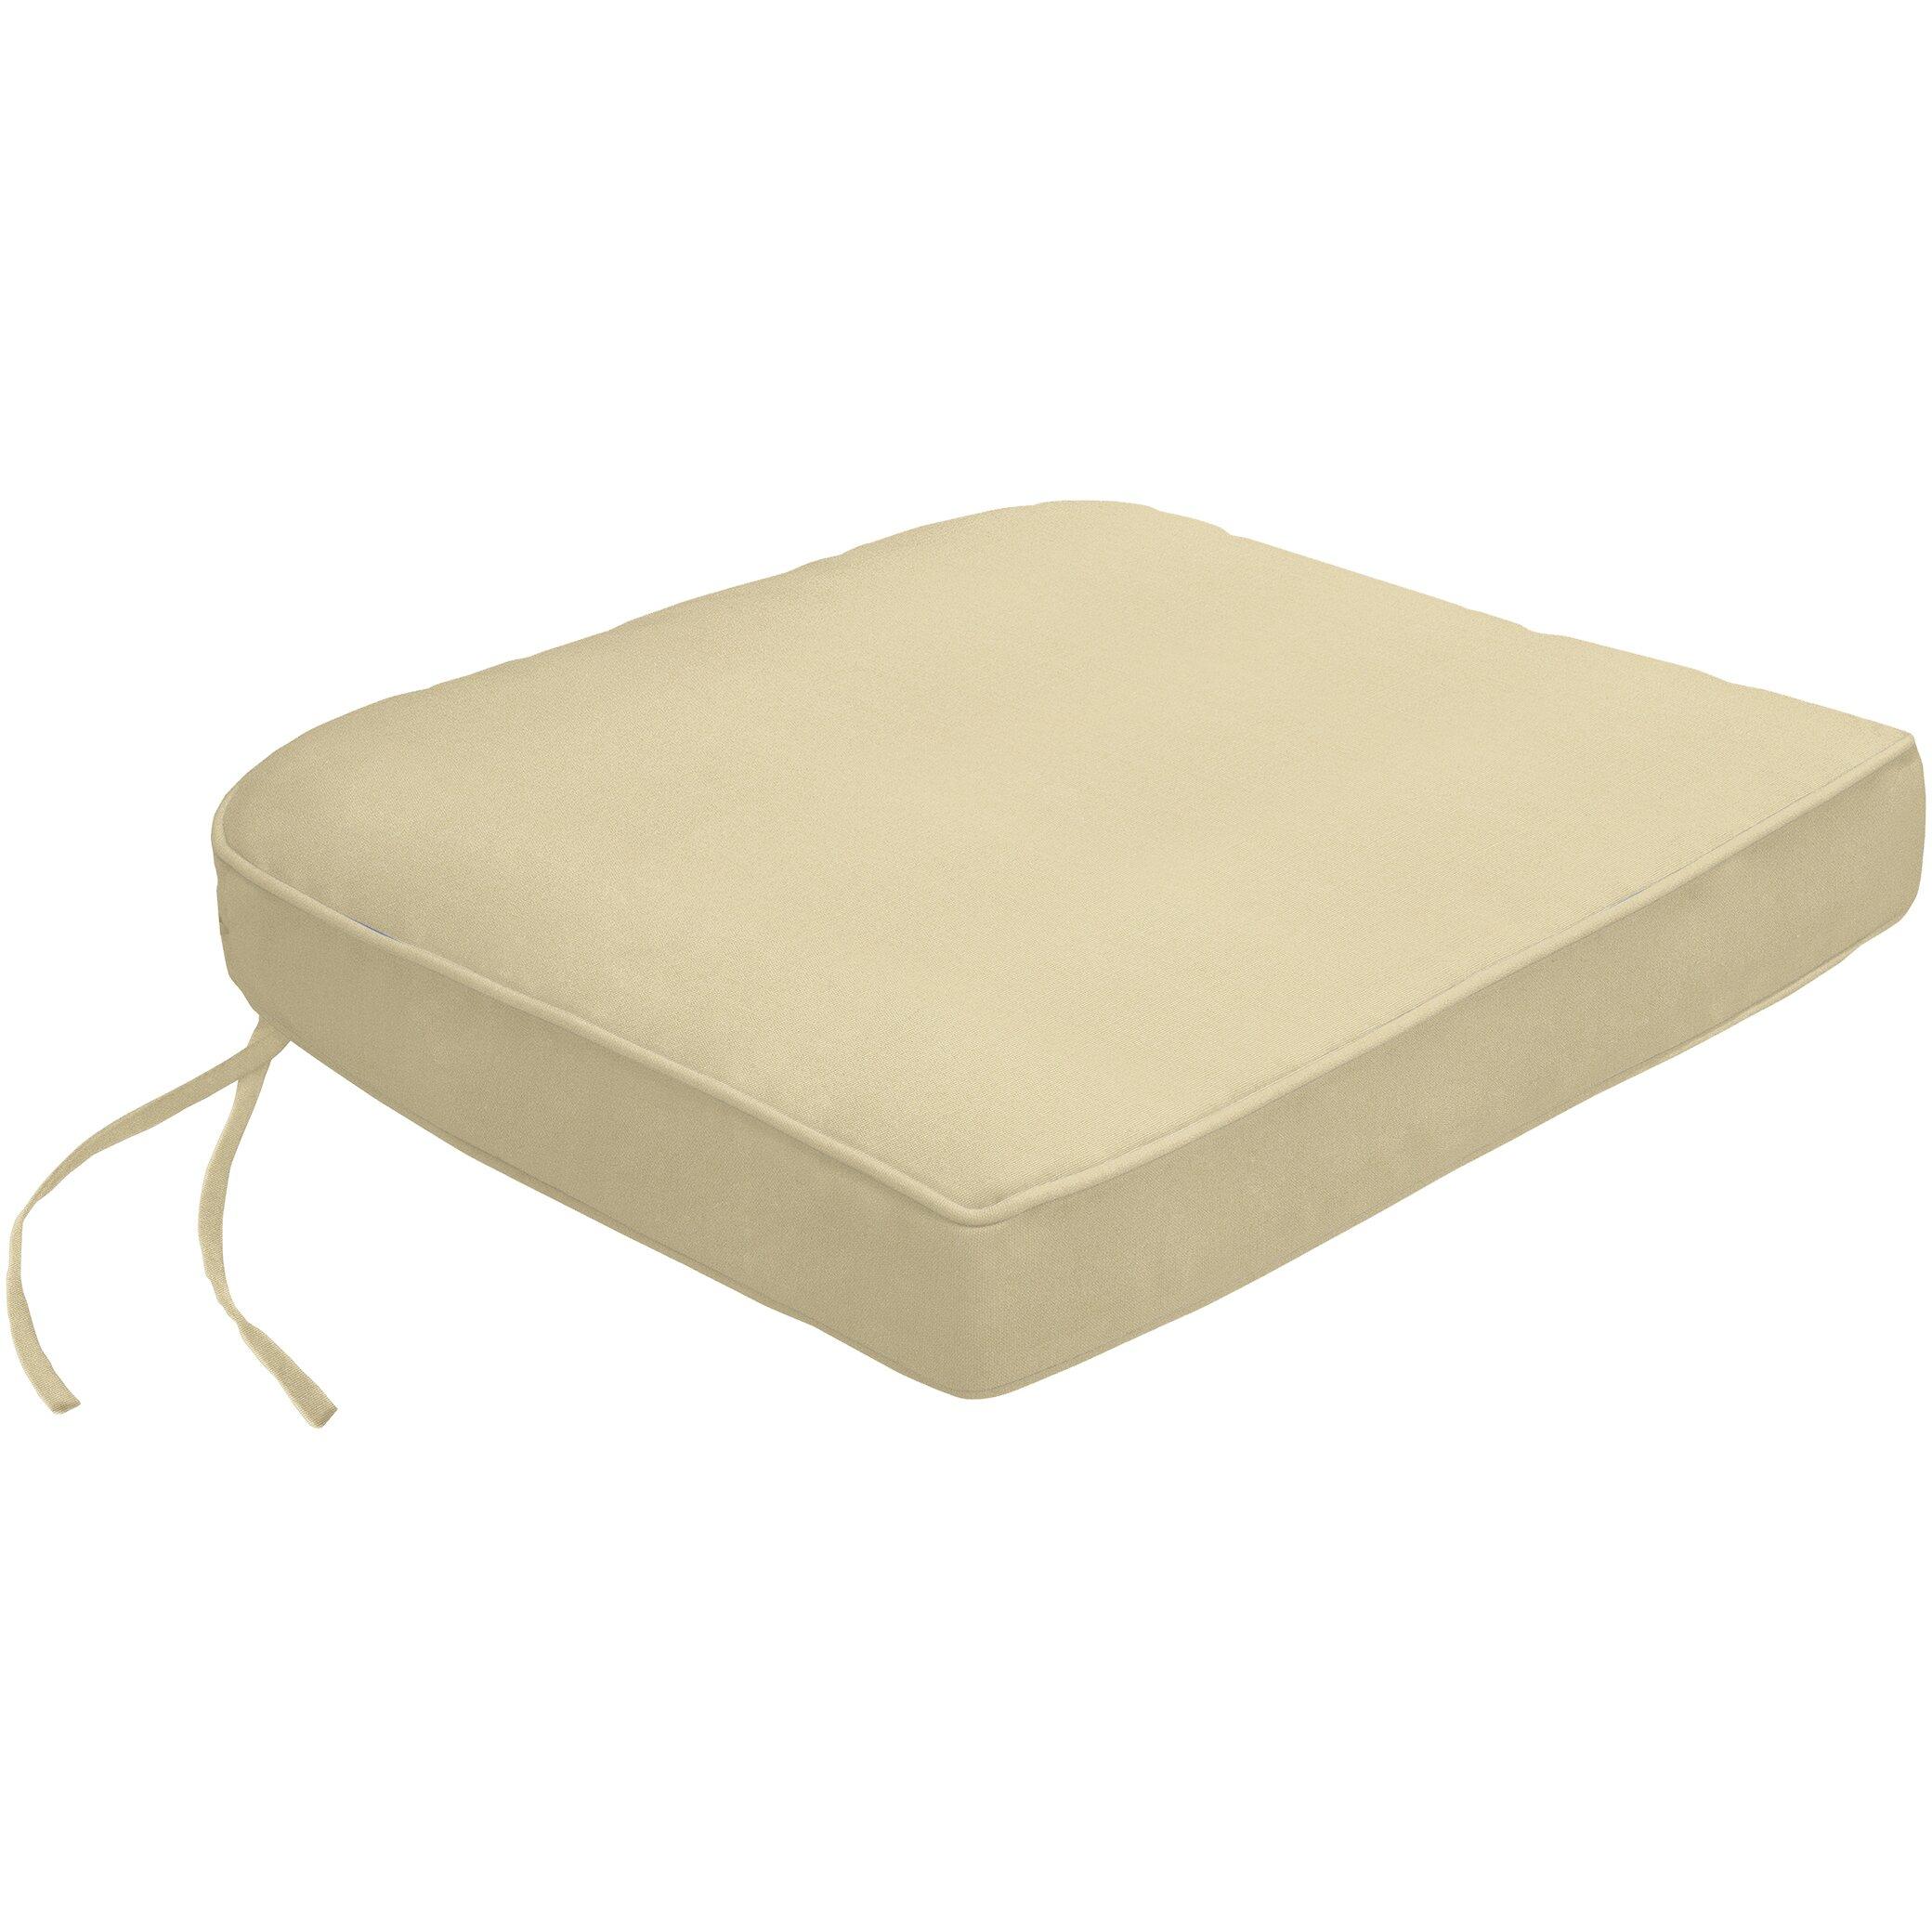 Wayfair Custom Outdoor Cushions Double Piped Sunbrella